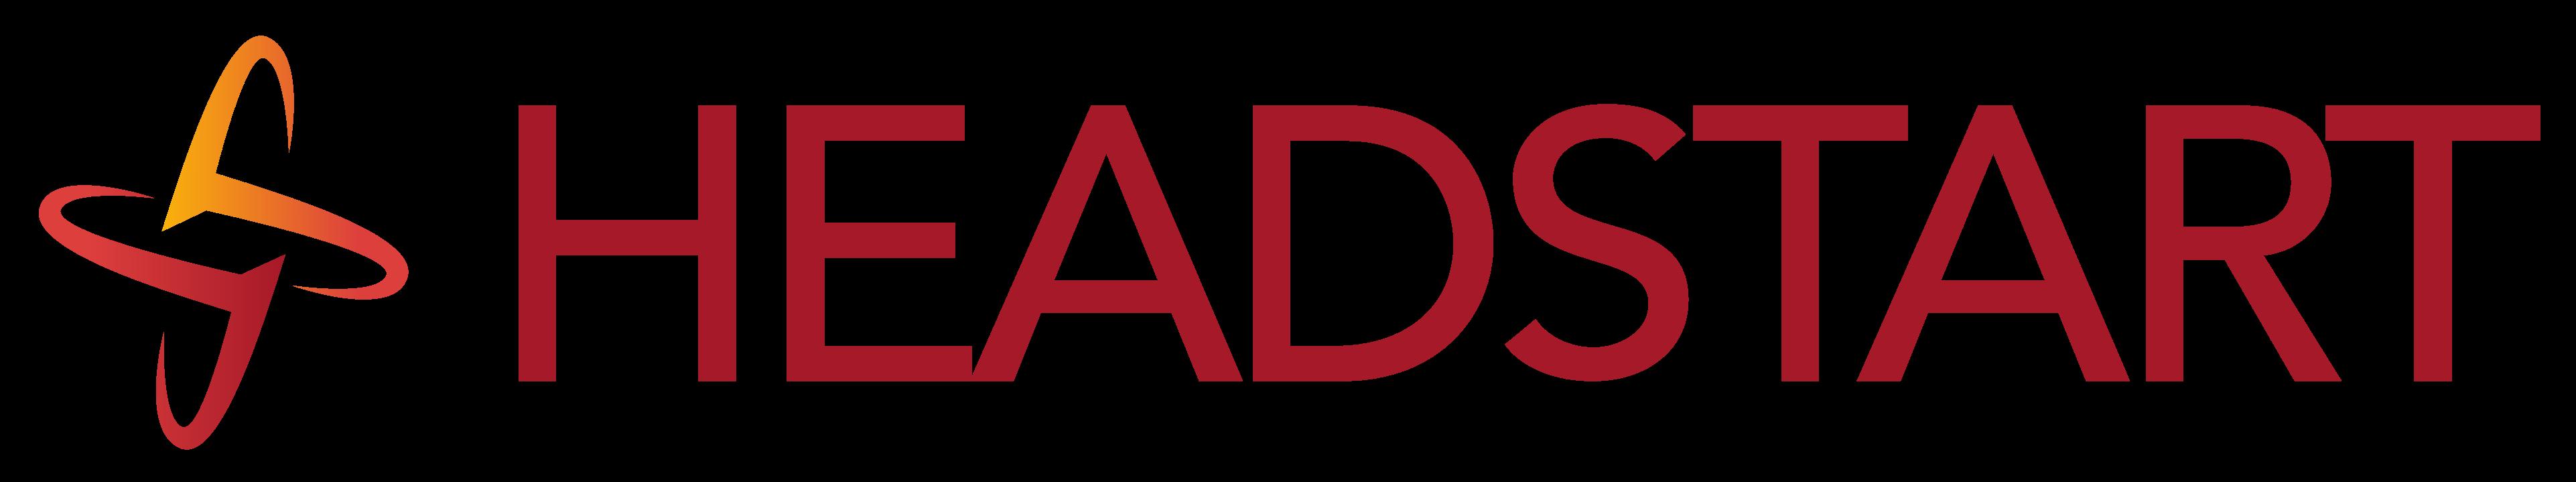 Headstart Network Foundation